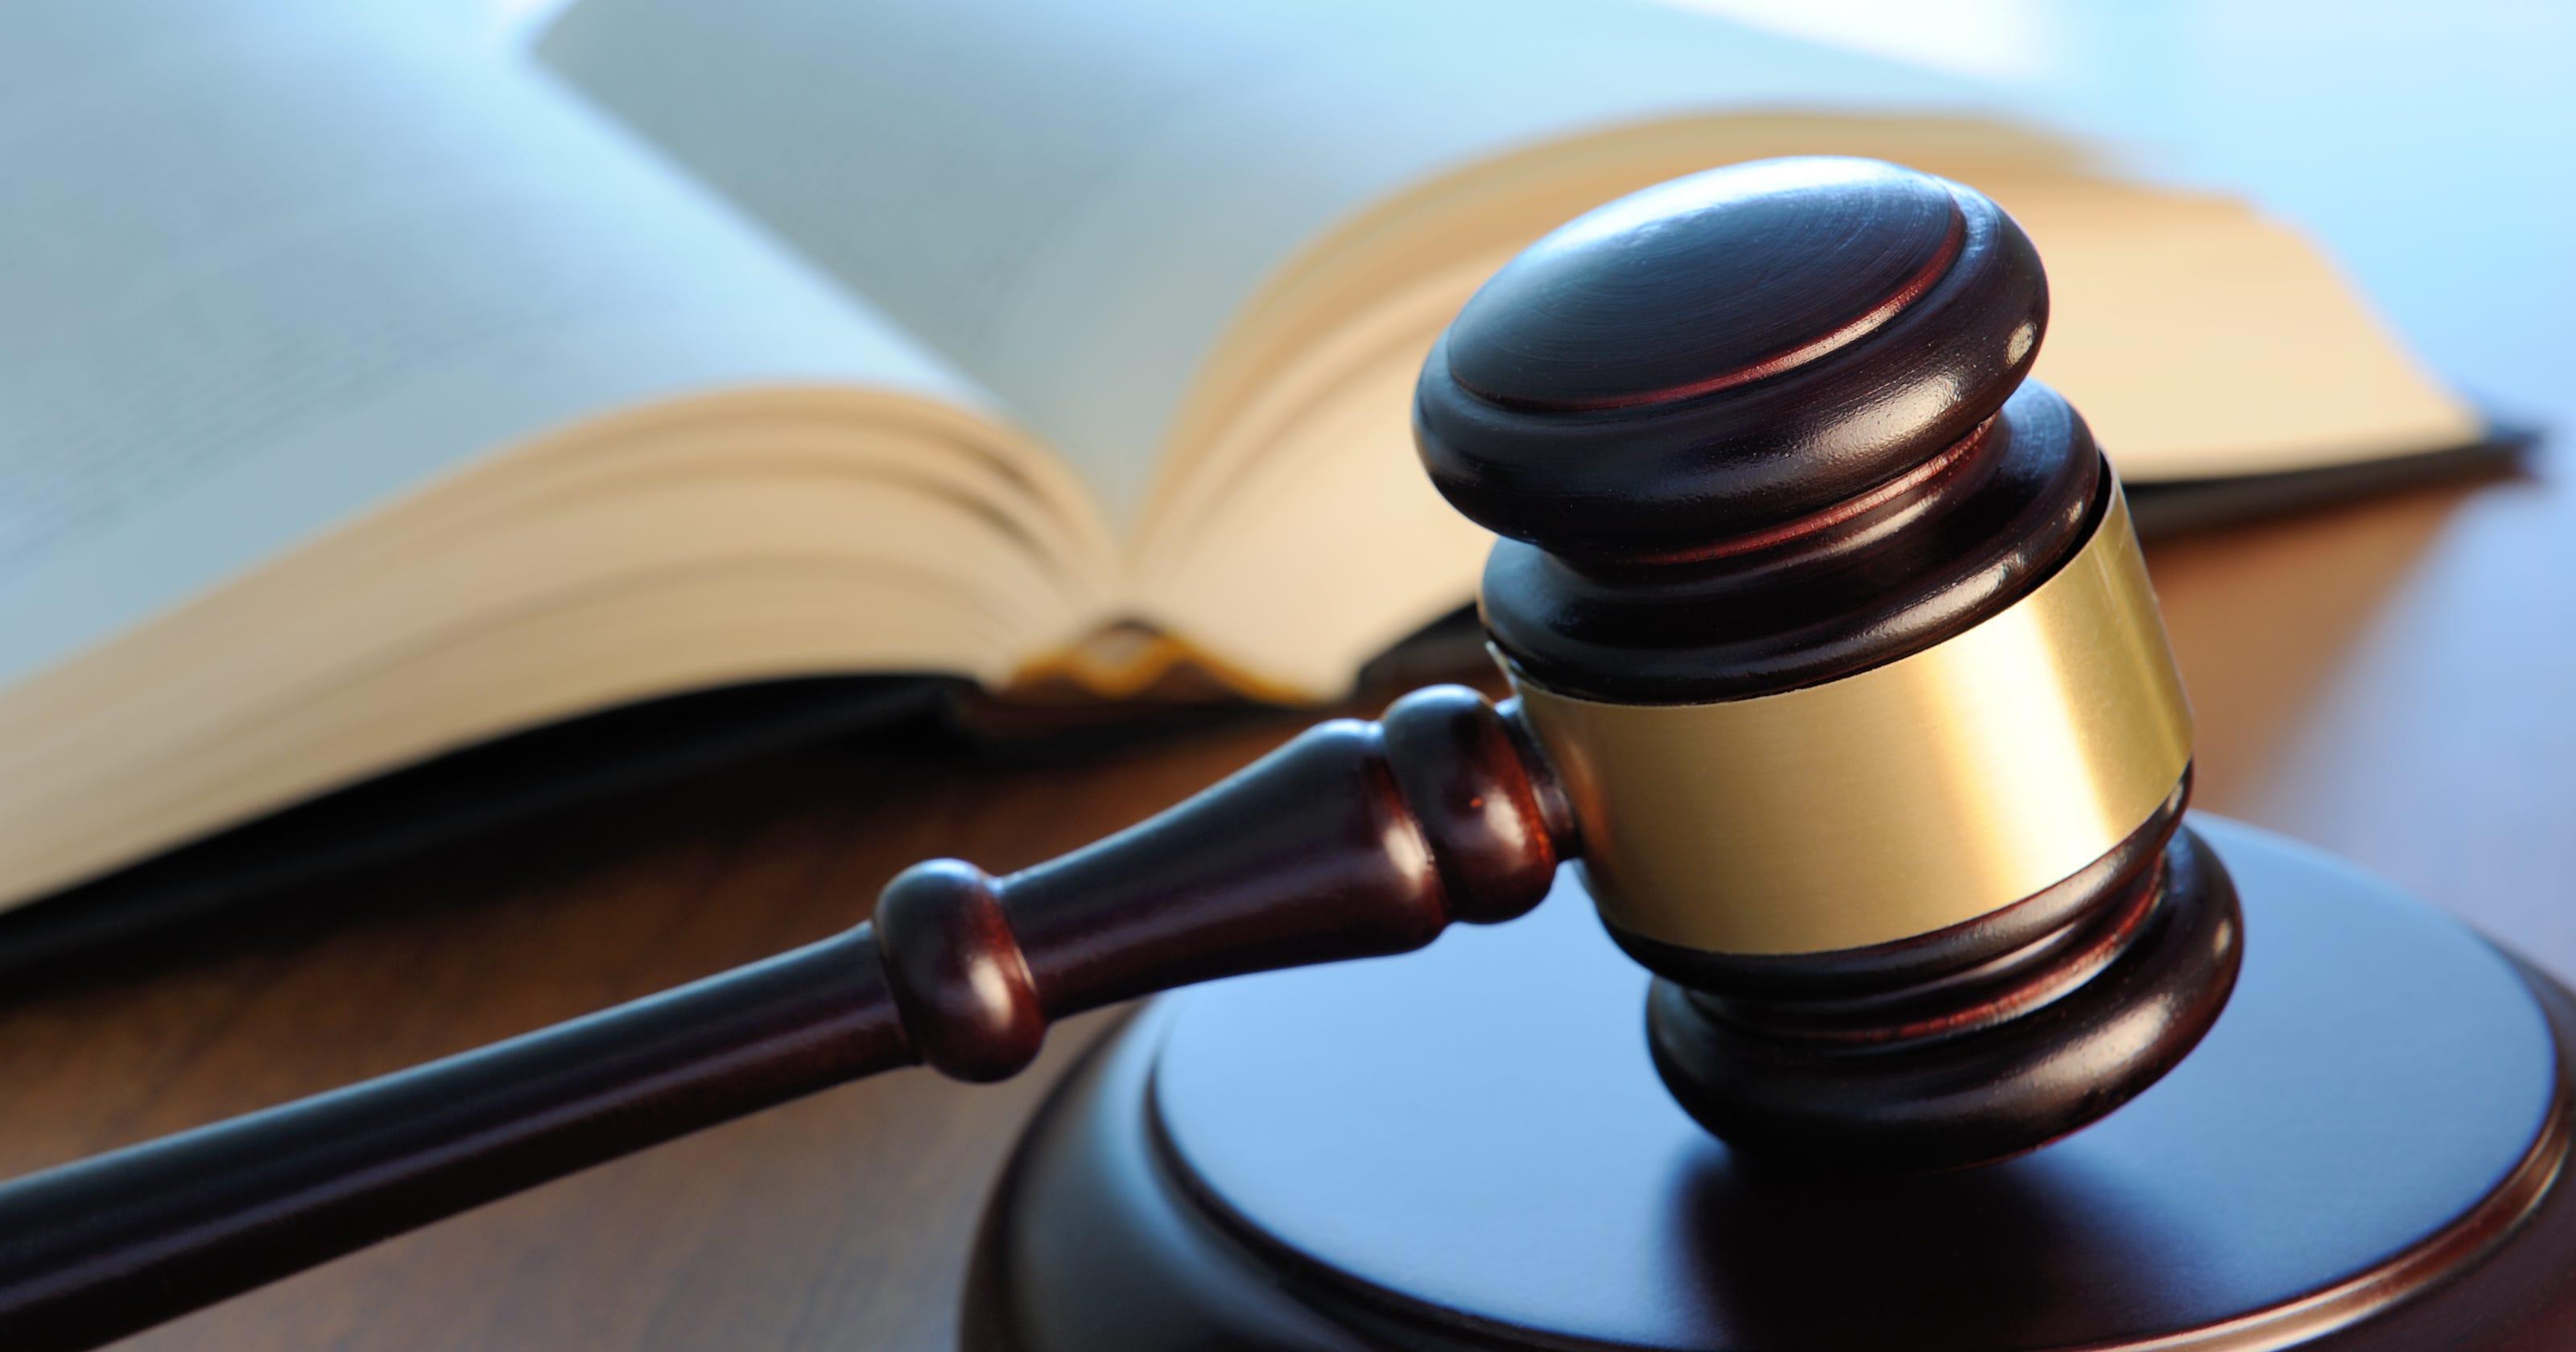 Ex-Siskiyou school teacher placed on probation for embezzlement